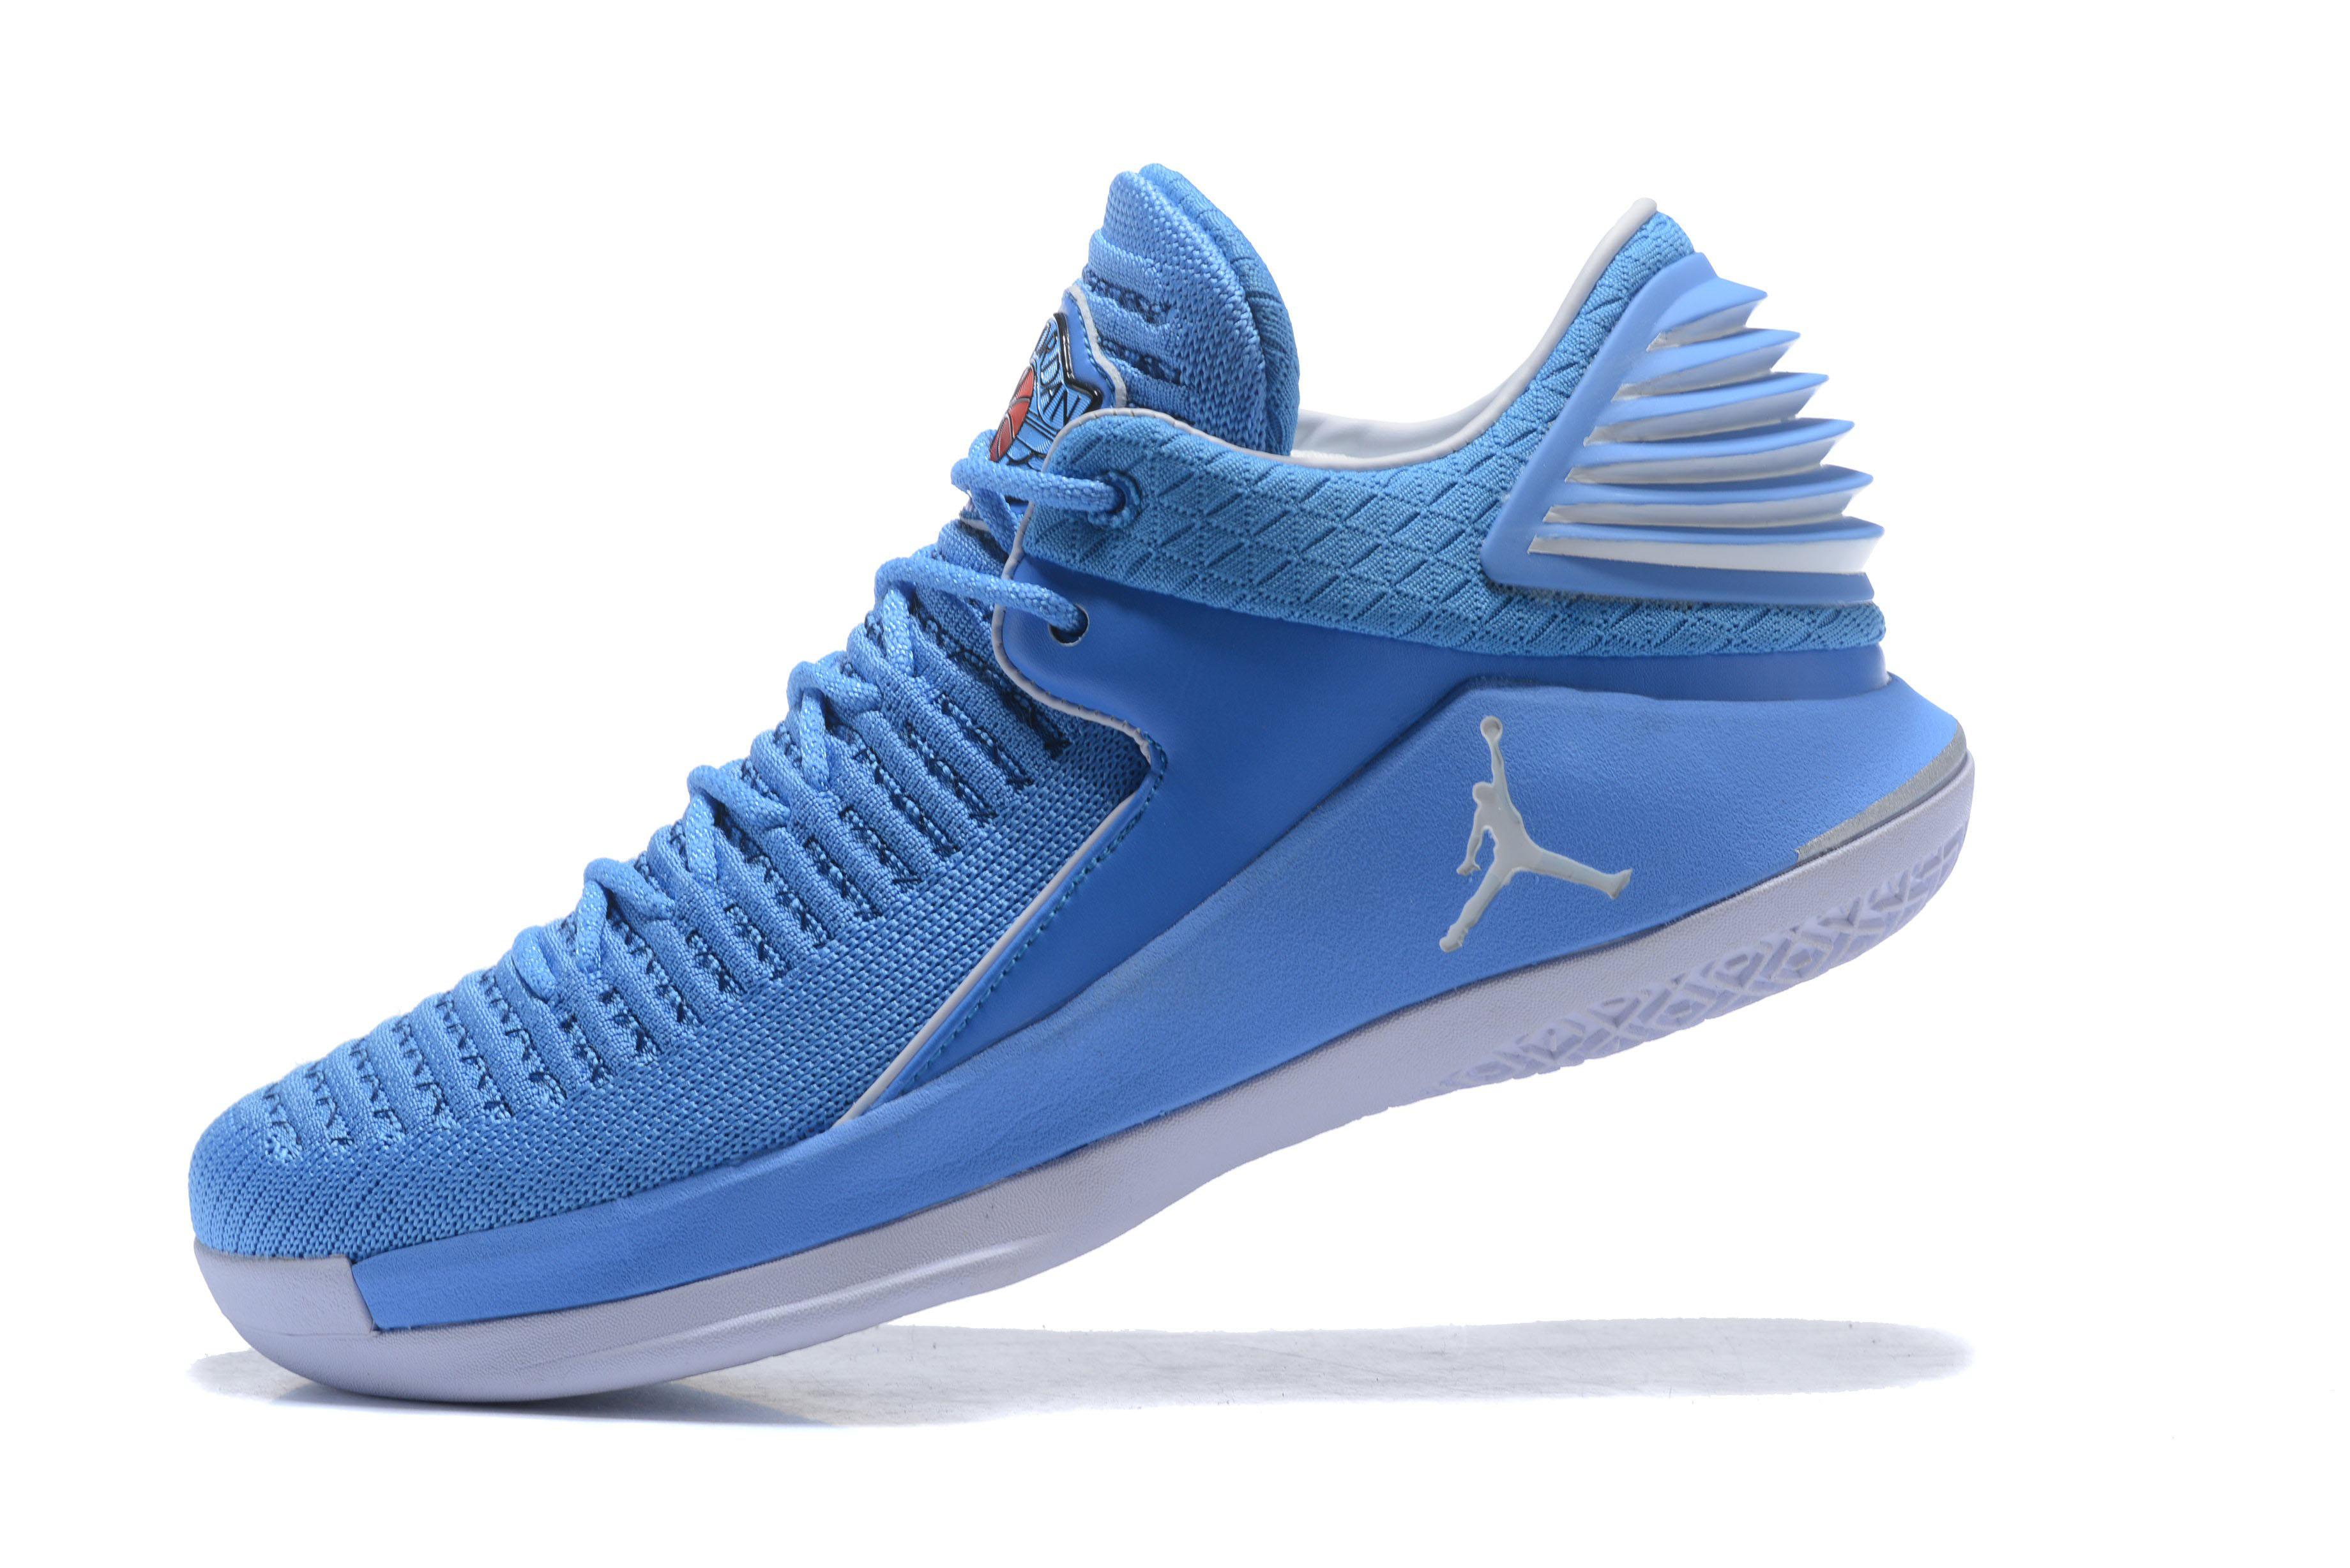 a11a451943f1 New Air Jordan 32 Low UNC University Blue White Men s Basketball Shoes